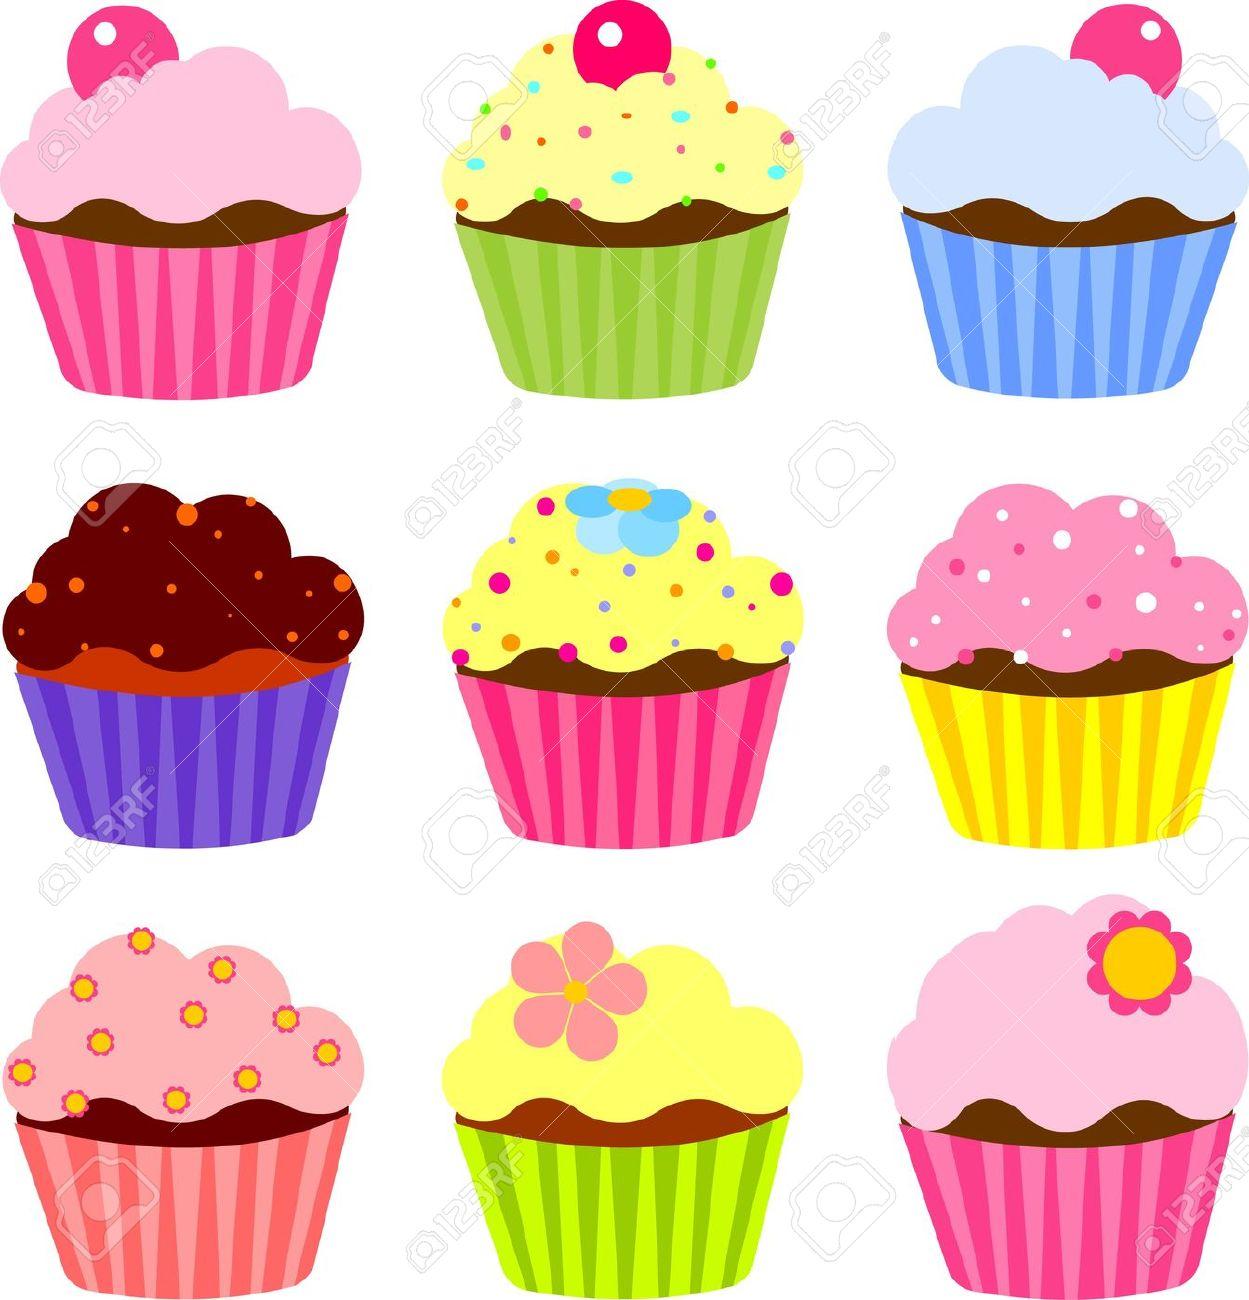 Cupcakes Clipart - Fotolip